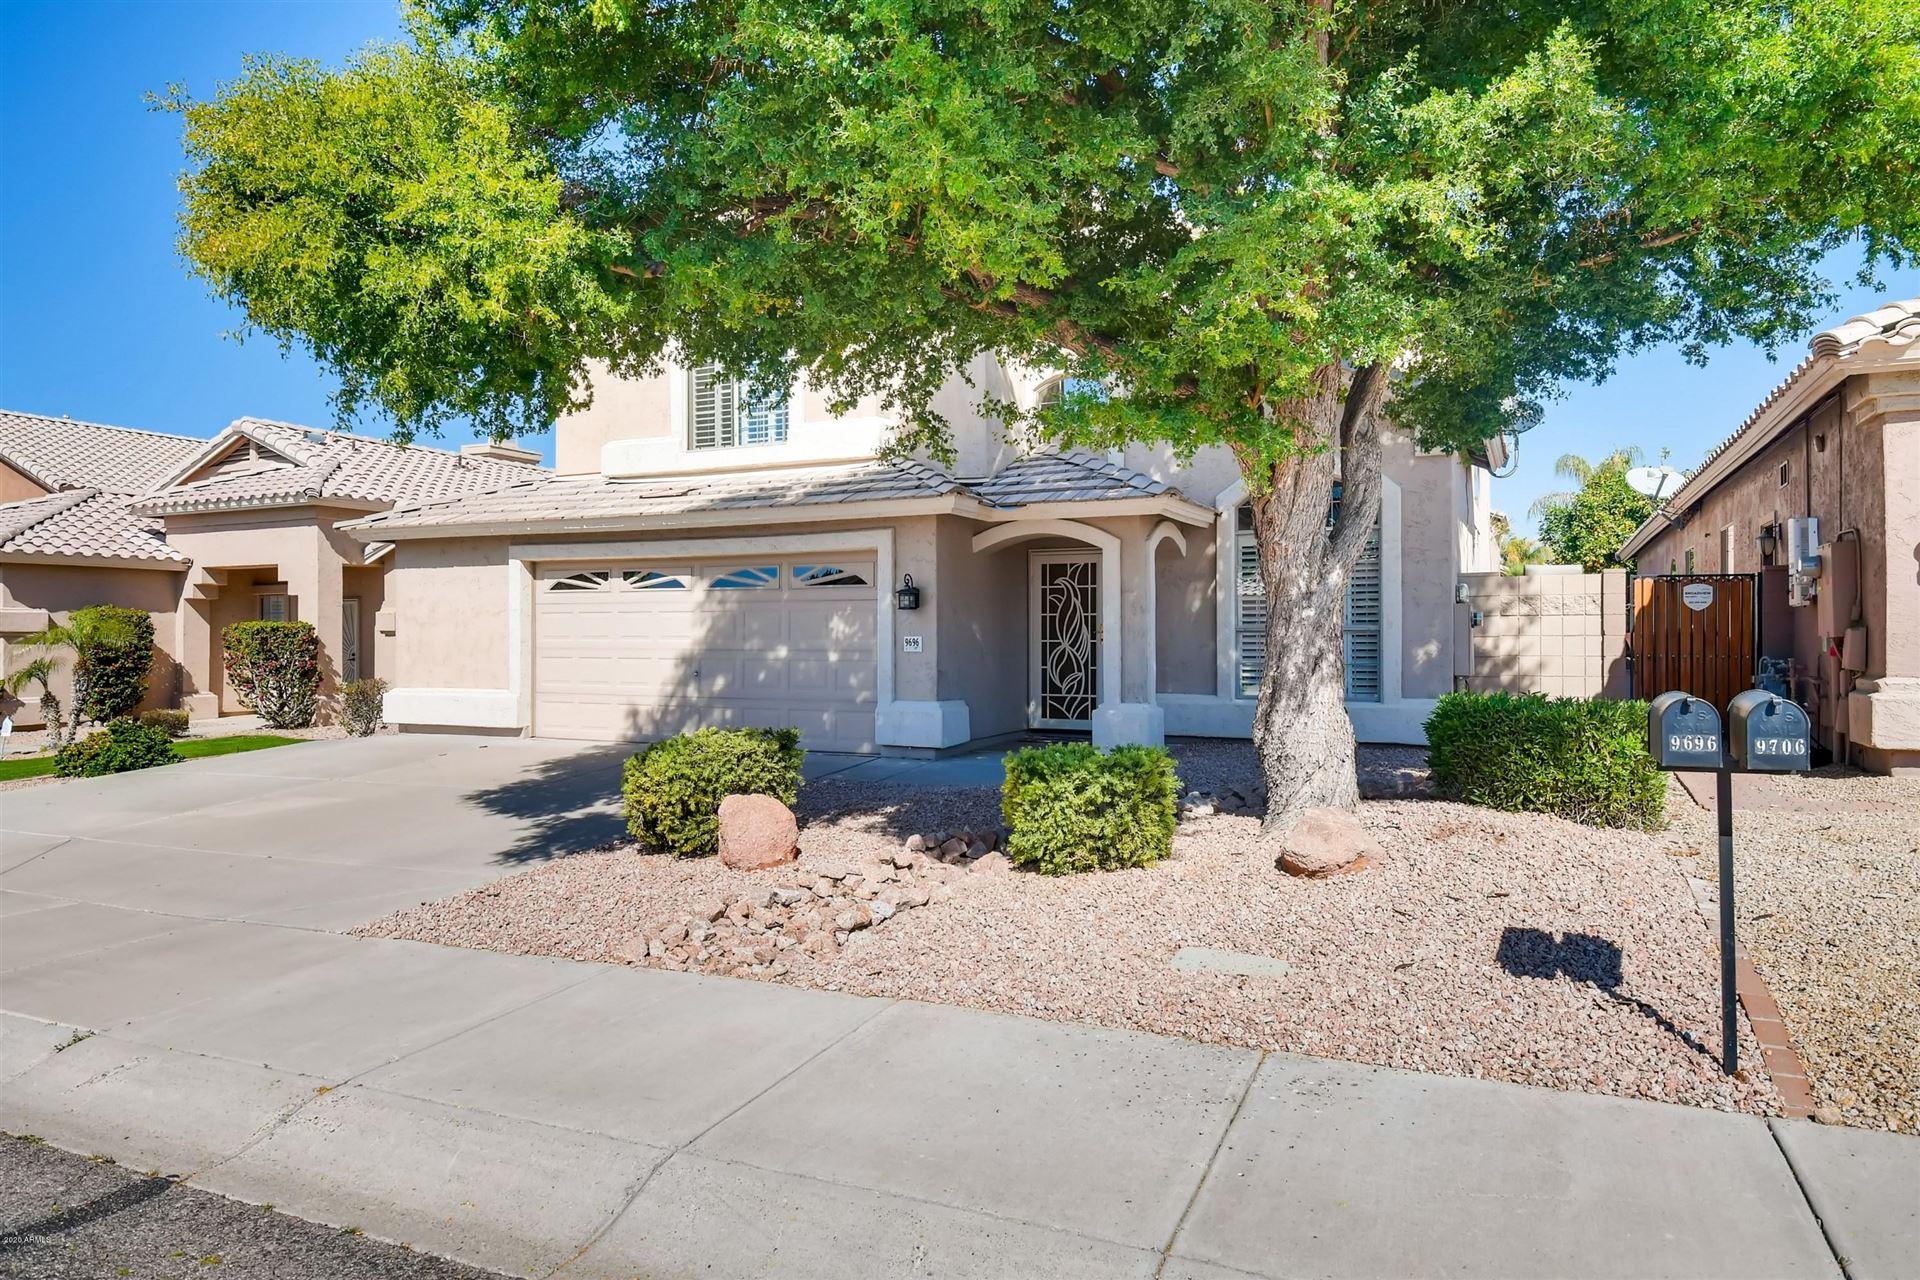 9696 E SHEENA Drive, Scottsdale, AZ 85260 - #: 6047751